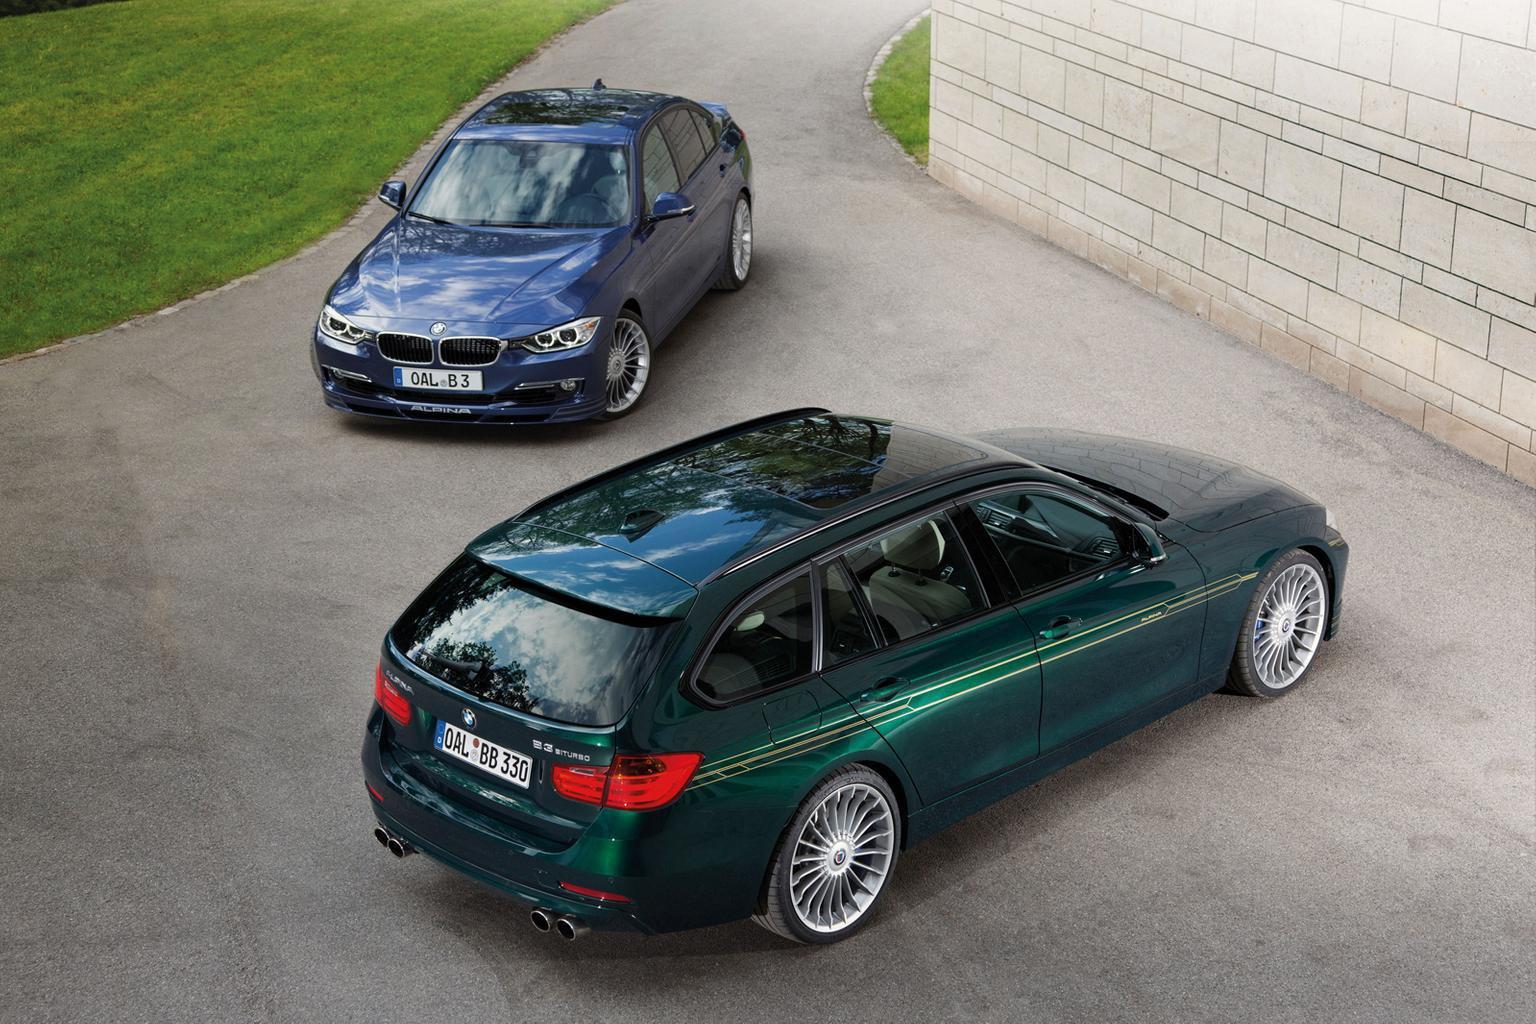 Alpina D3 Bi-turbo saloon and estate revealed